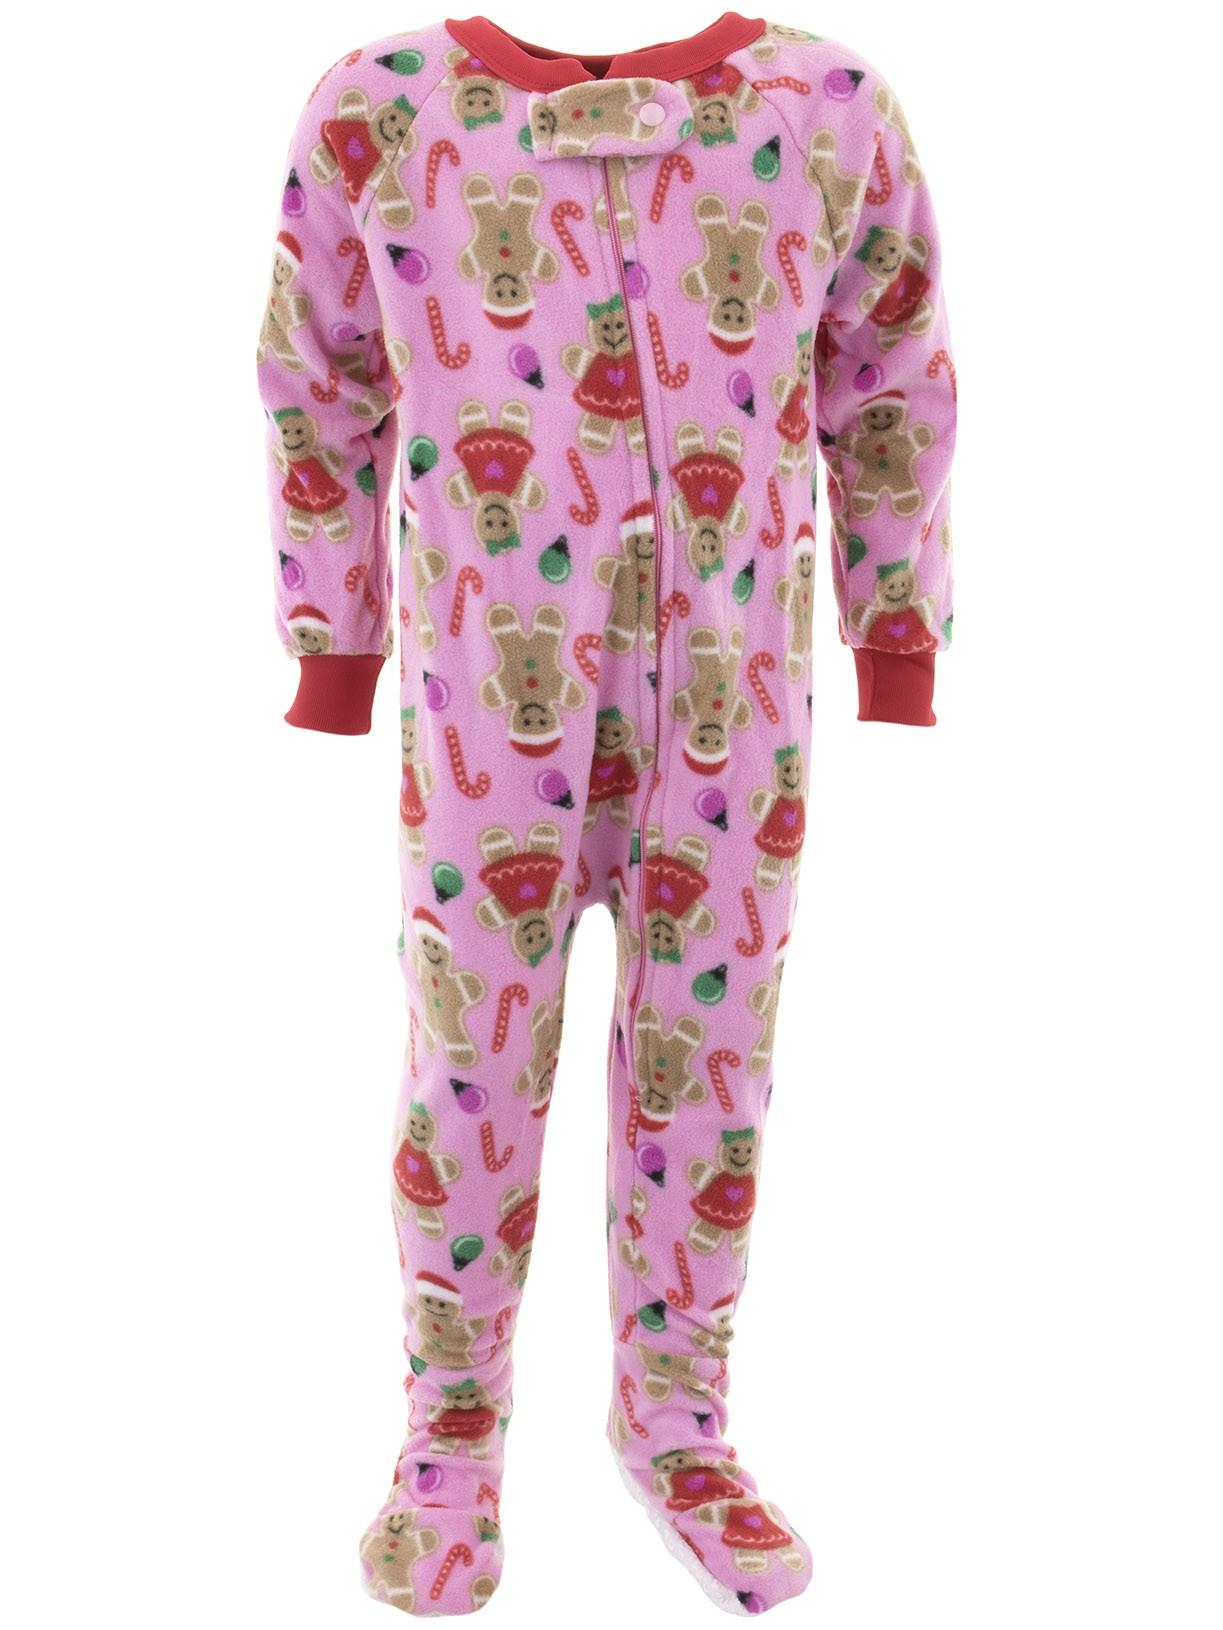 Mon Petit Girls Christmas Pink Footed Pajamas - Walmart.com